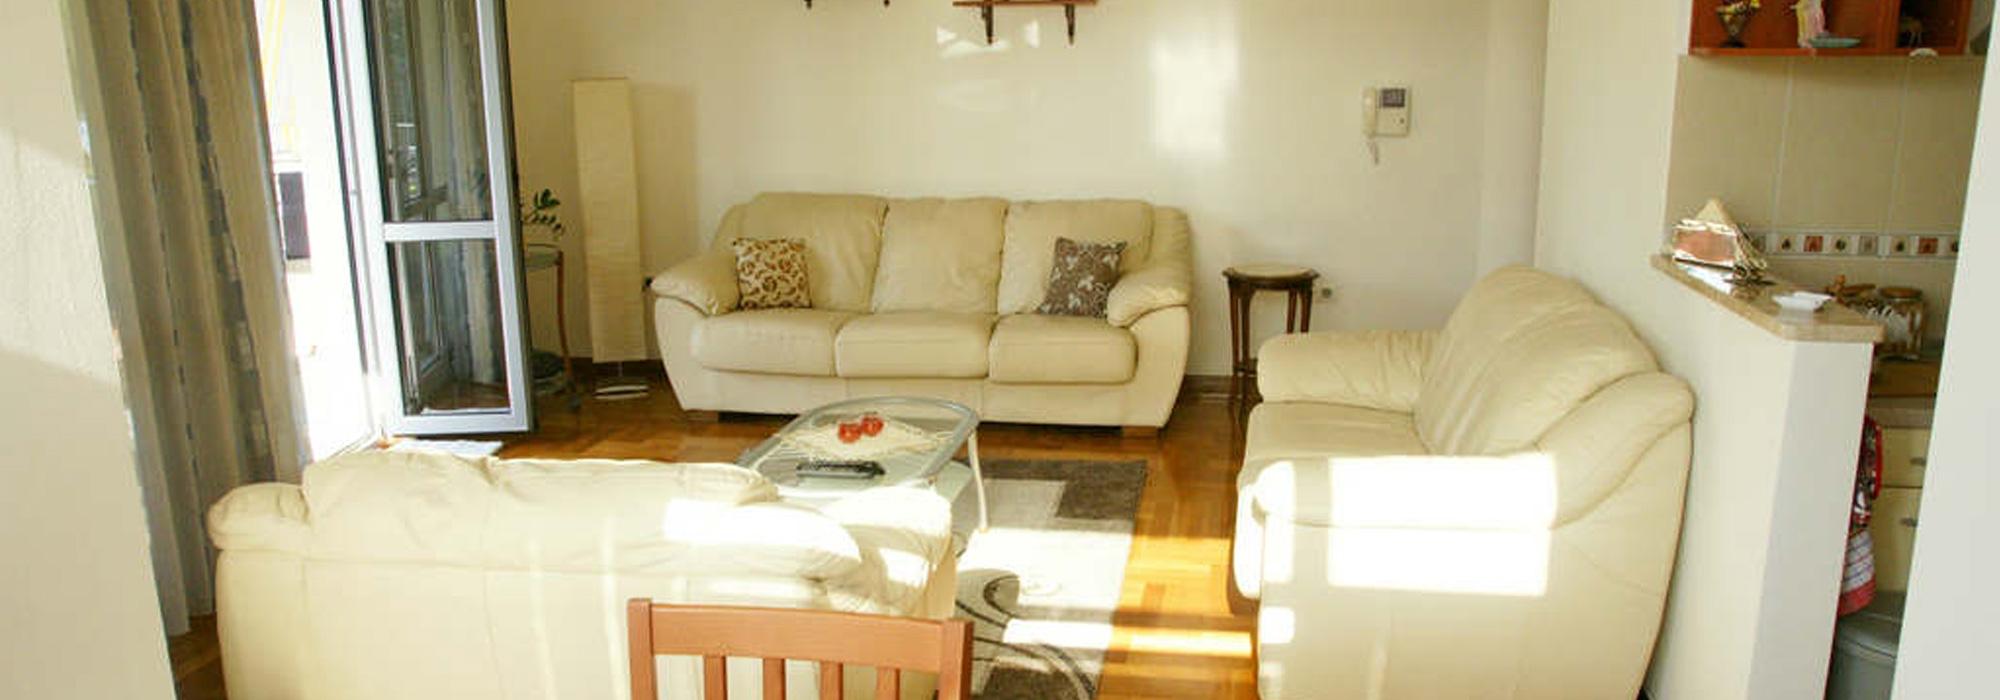 Apartment Budva, 54m2, furnished, great location